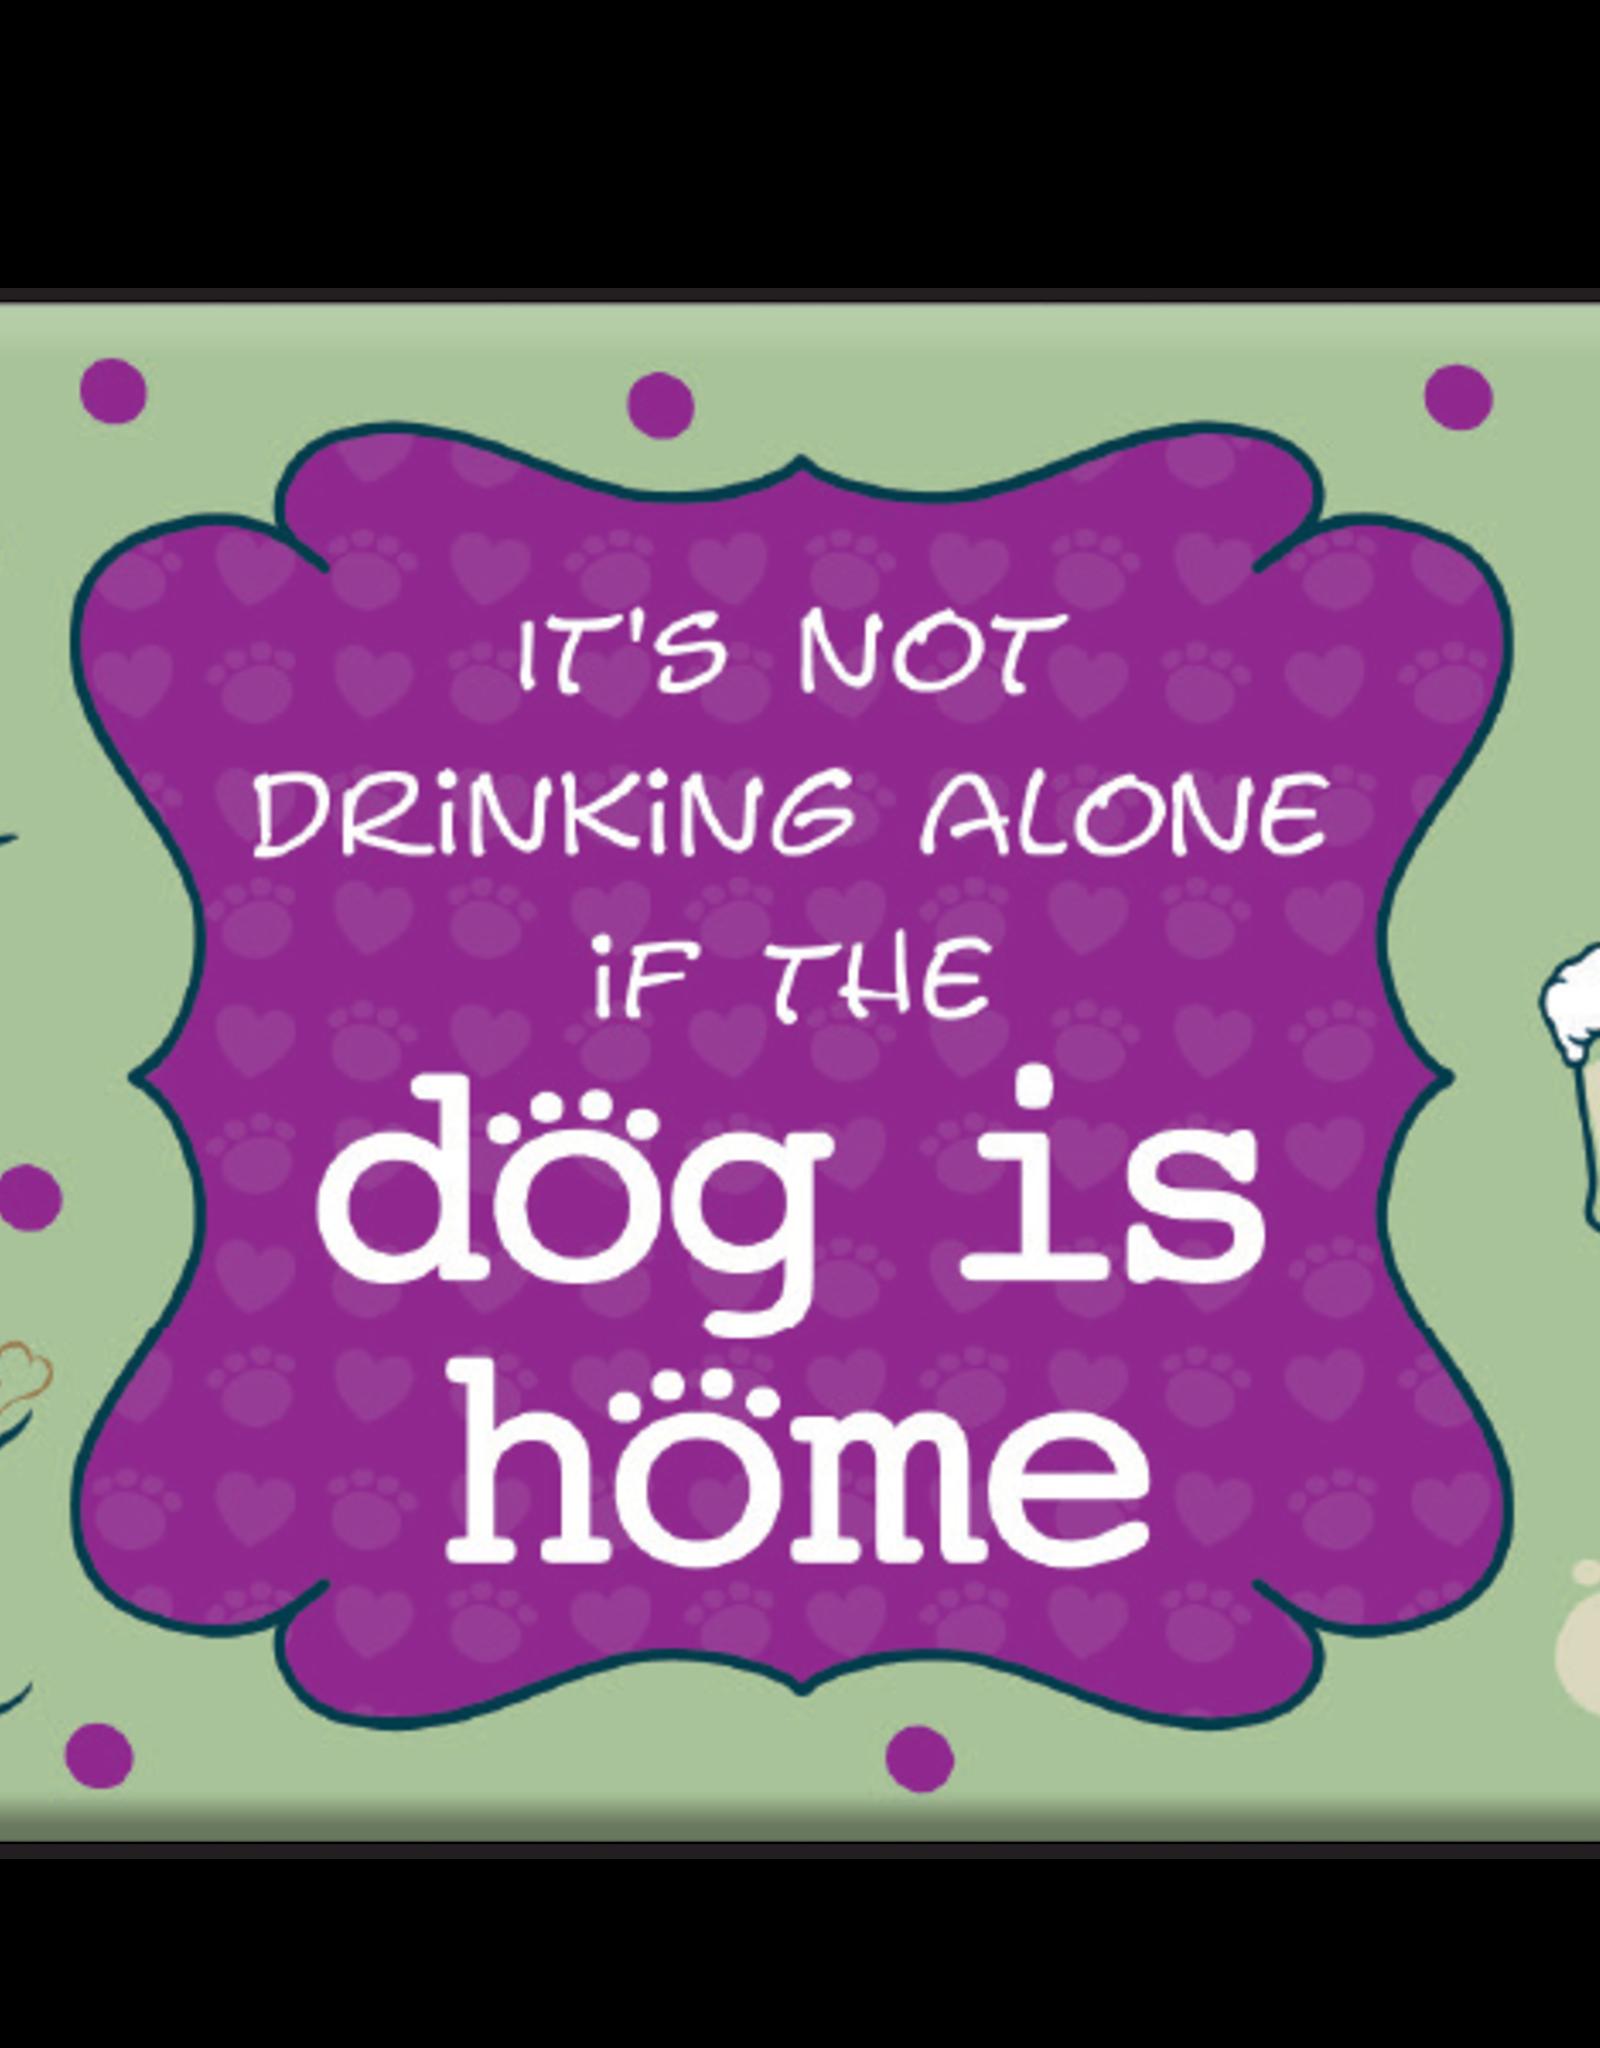 Dog Speak Dog Speak Refrigerator Magnet - It's Not Drinking Alone if the Dog is Home